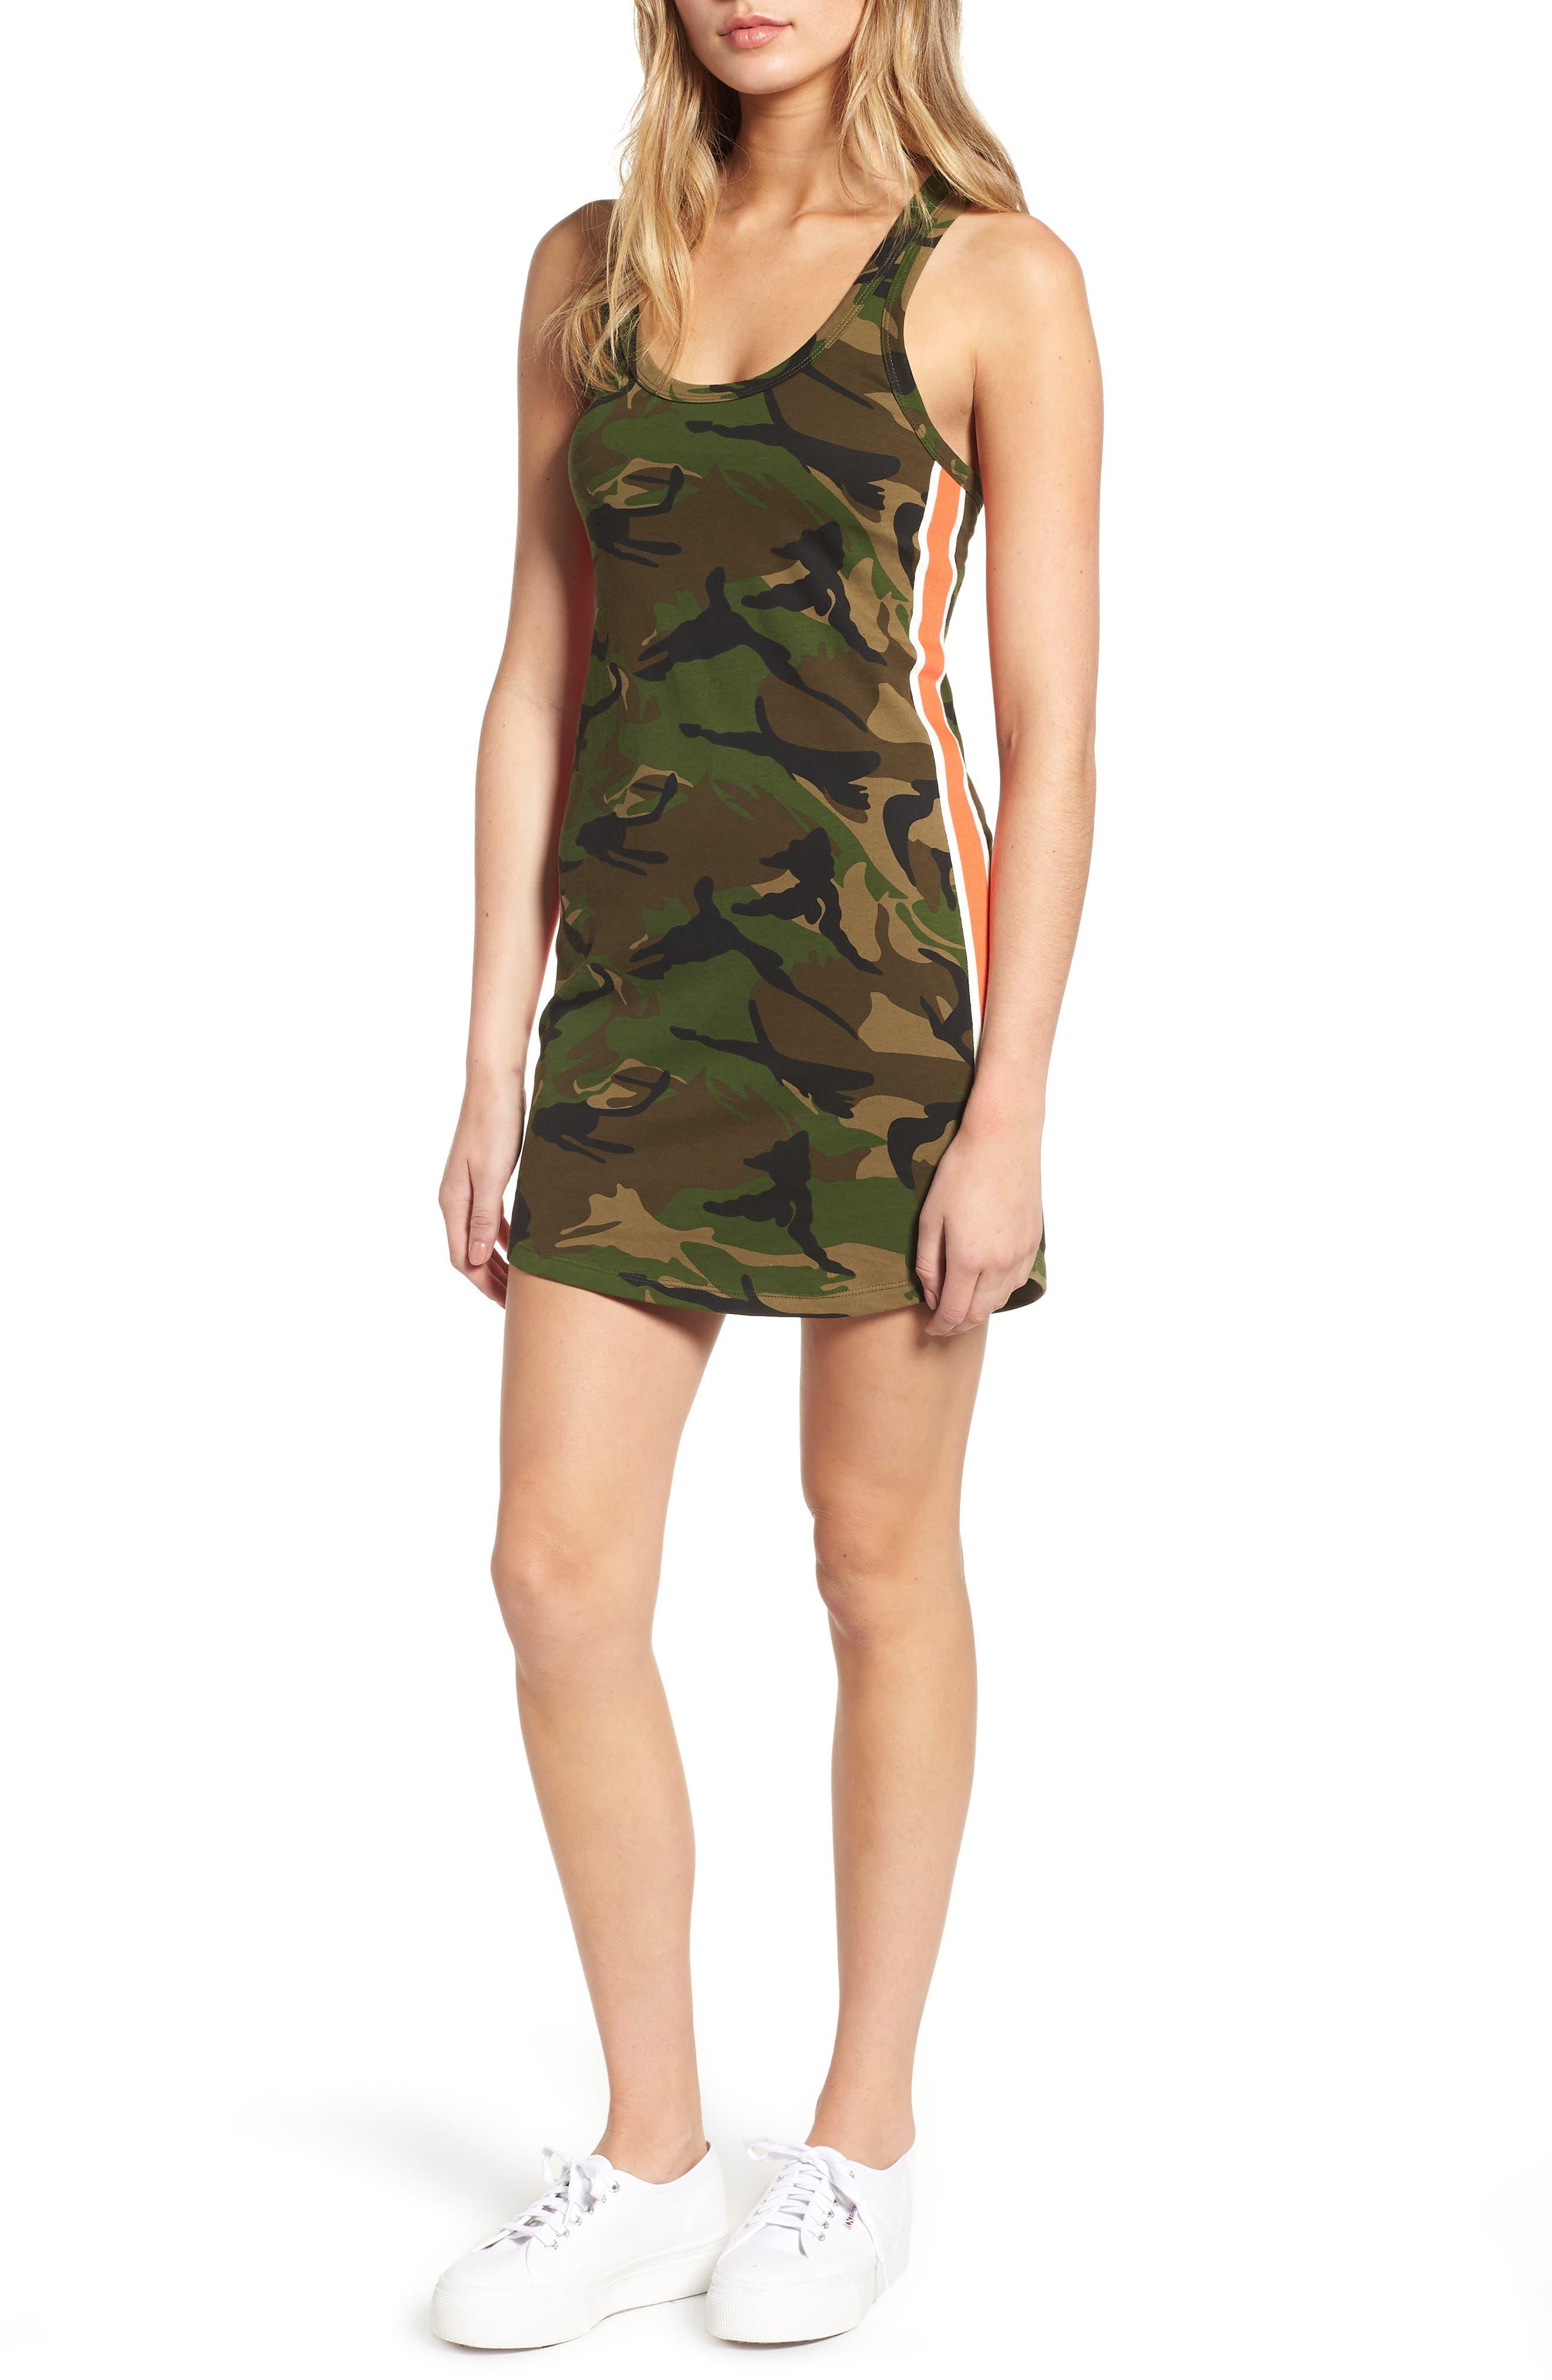 Camo Print Tank Dress,                             Main thumbnail 1, color,                             ARMY CAMO